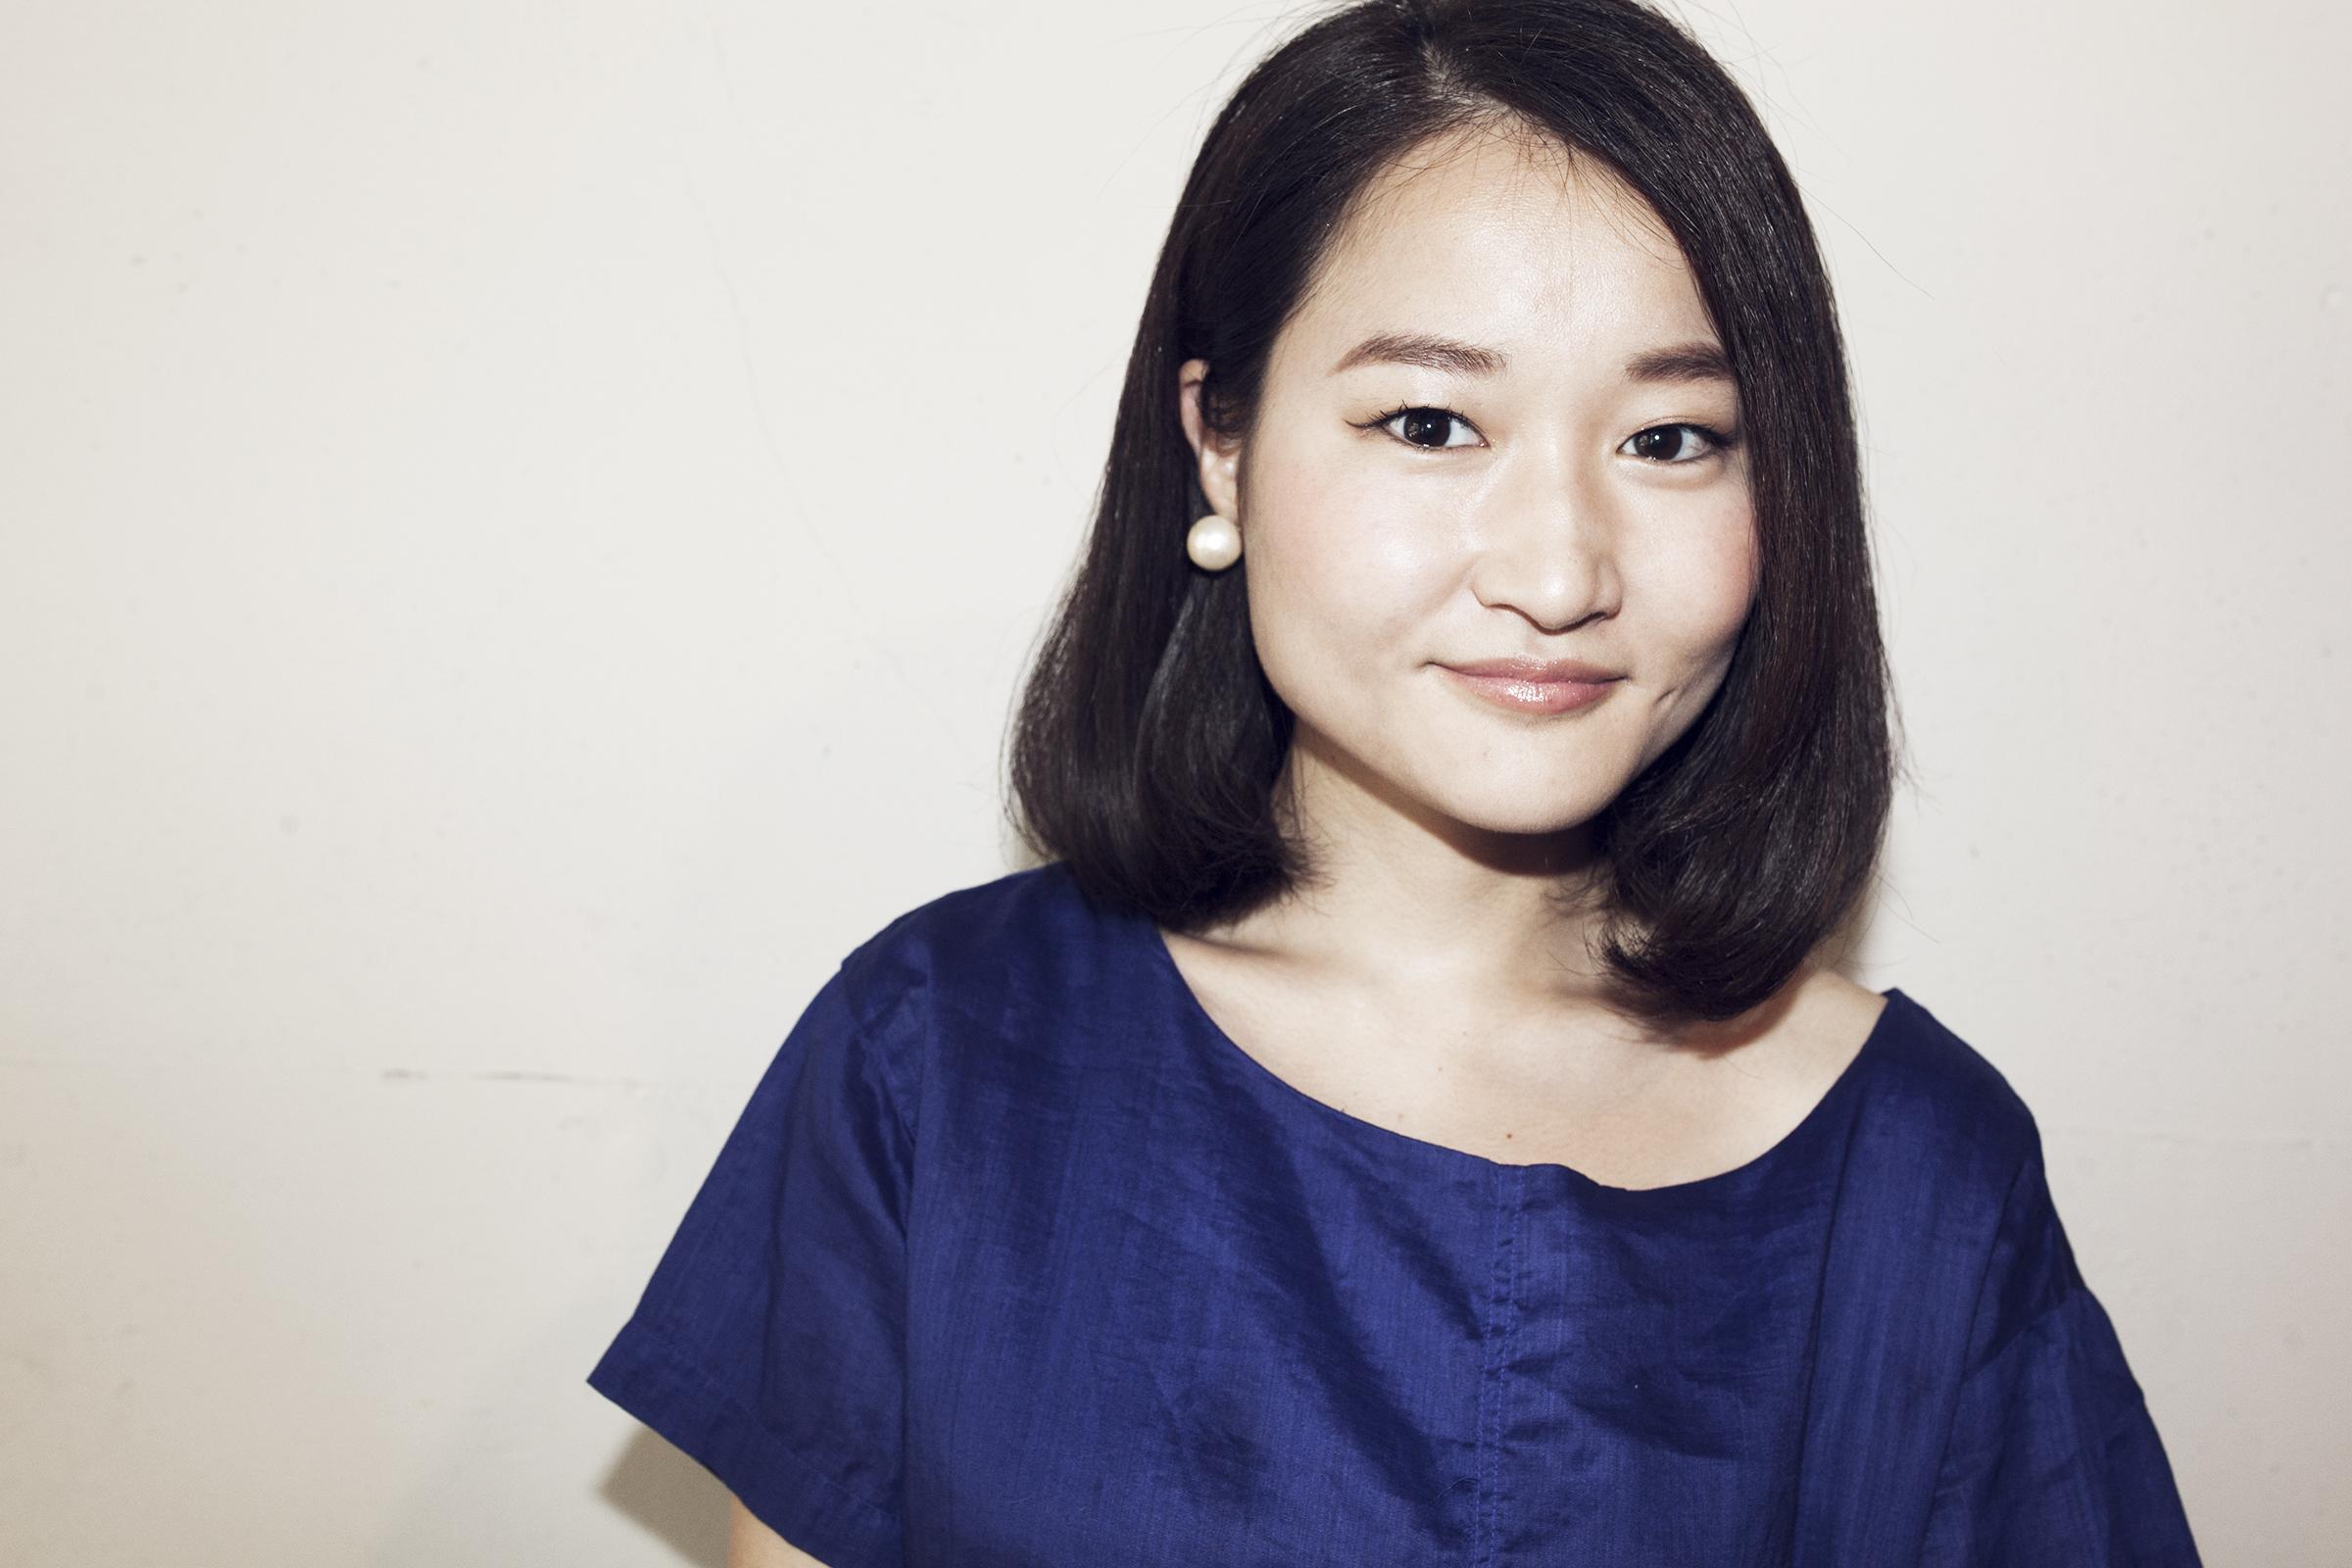 Ai Nakayama   中山 藍  Stylist  東京都出身。 日本美容専門学校。 2007年、都内1店舗を経てSavaに参加。 サロンワーク、着物の着付けなどで活動。